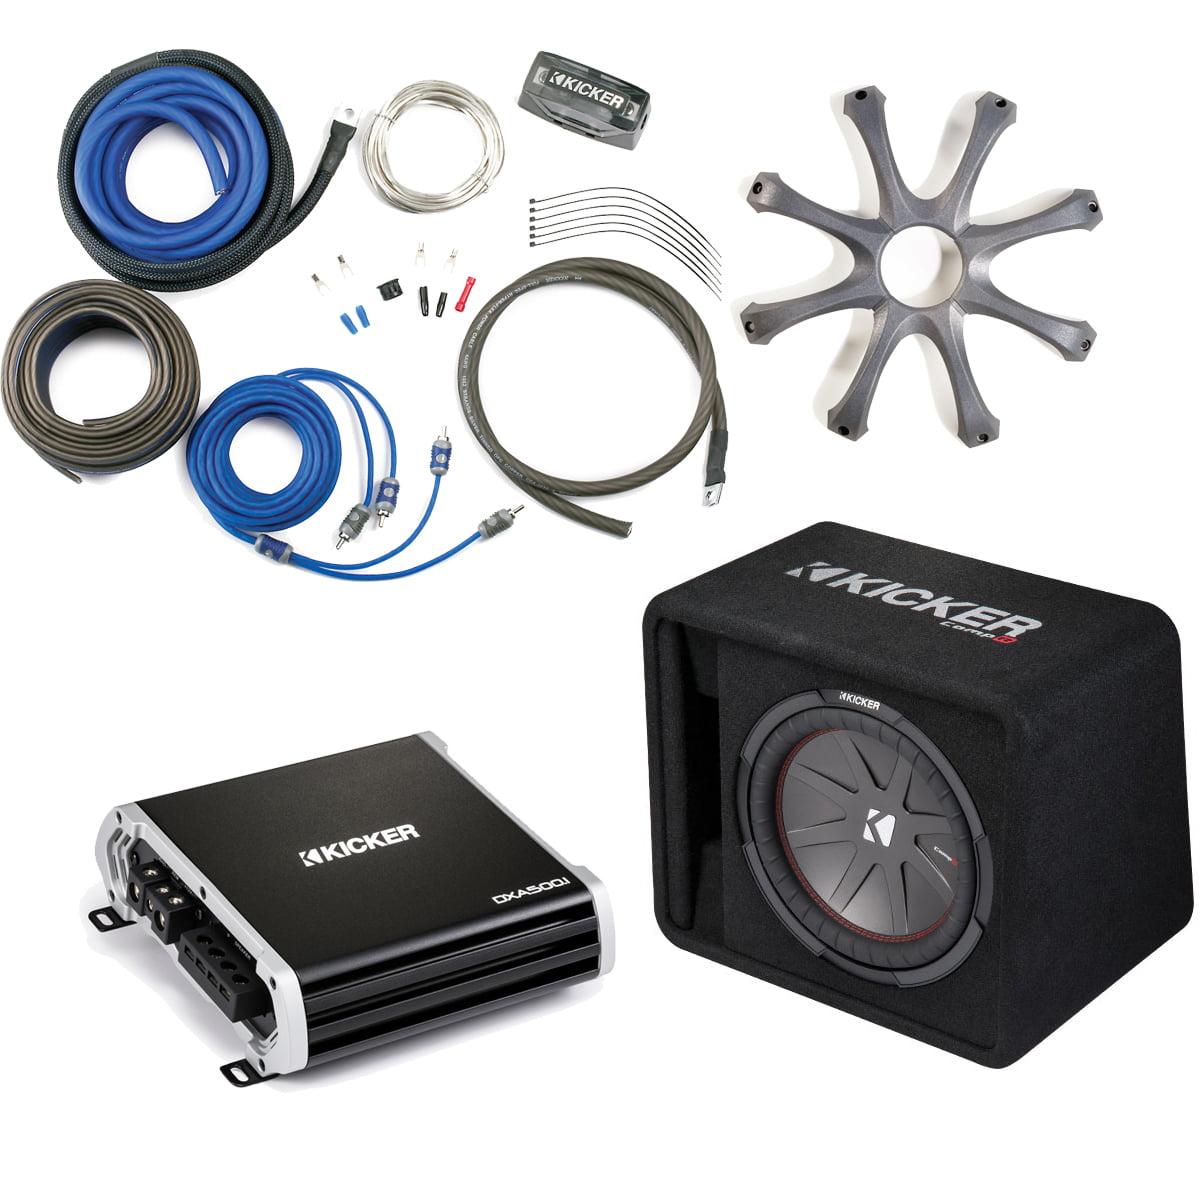 Kicker 43VCWR122 Comp R ported enclosure w/  500 Watt Kicker DXA5001 Amplifier, wiring kit, grille, and bass knob.